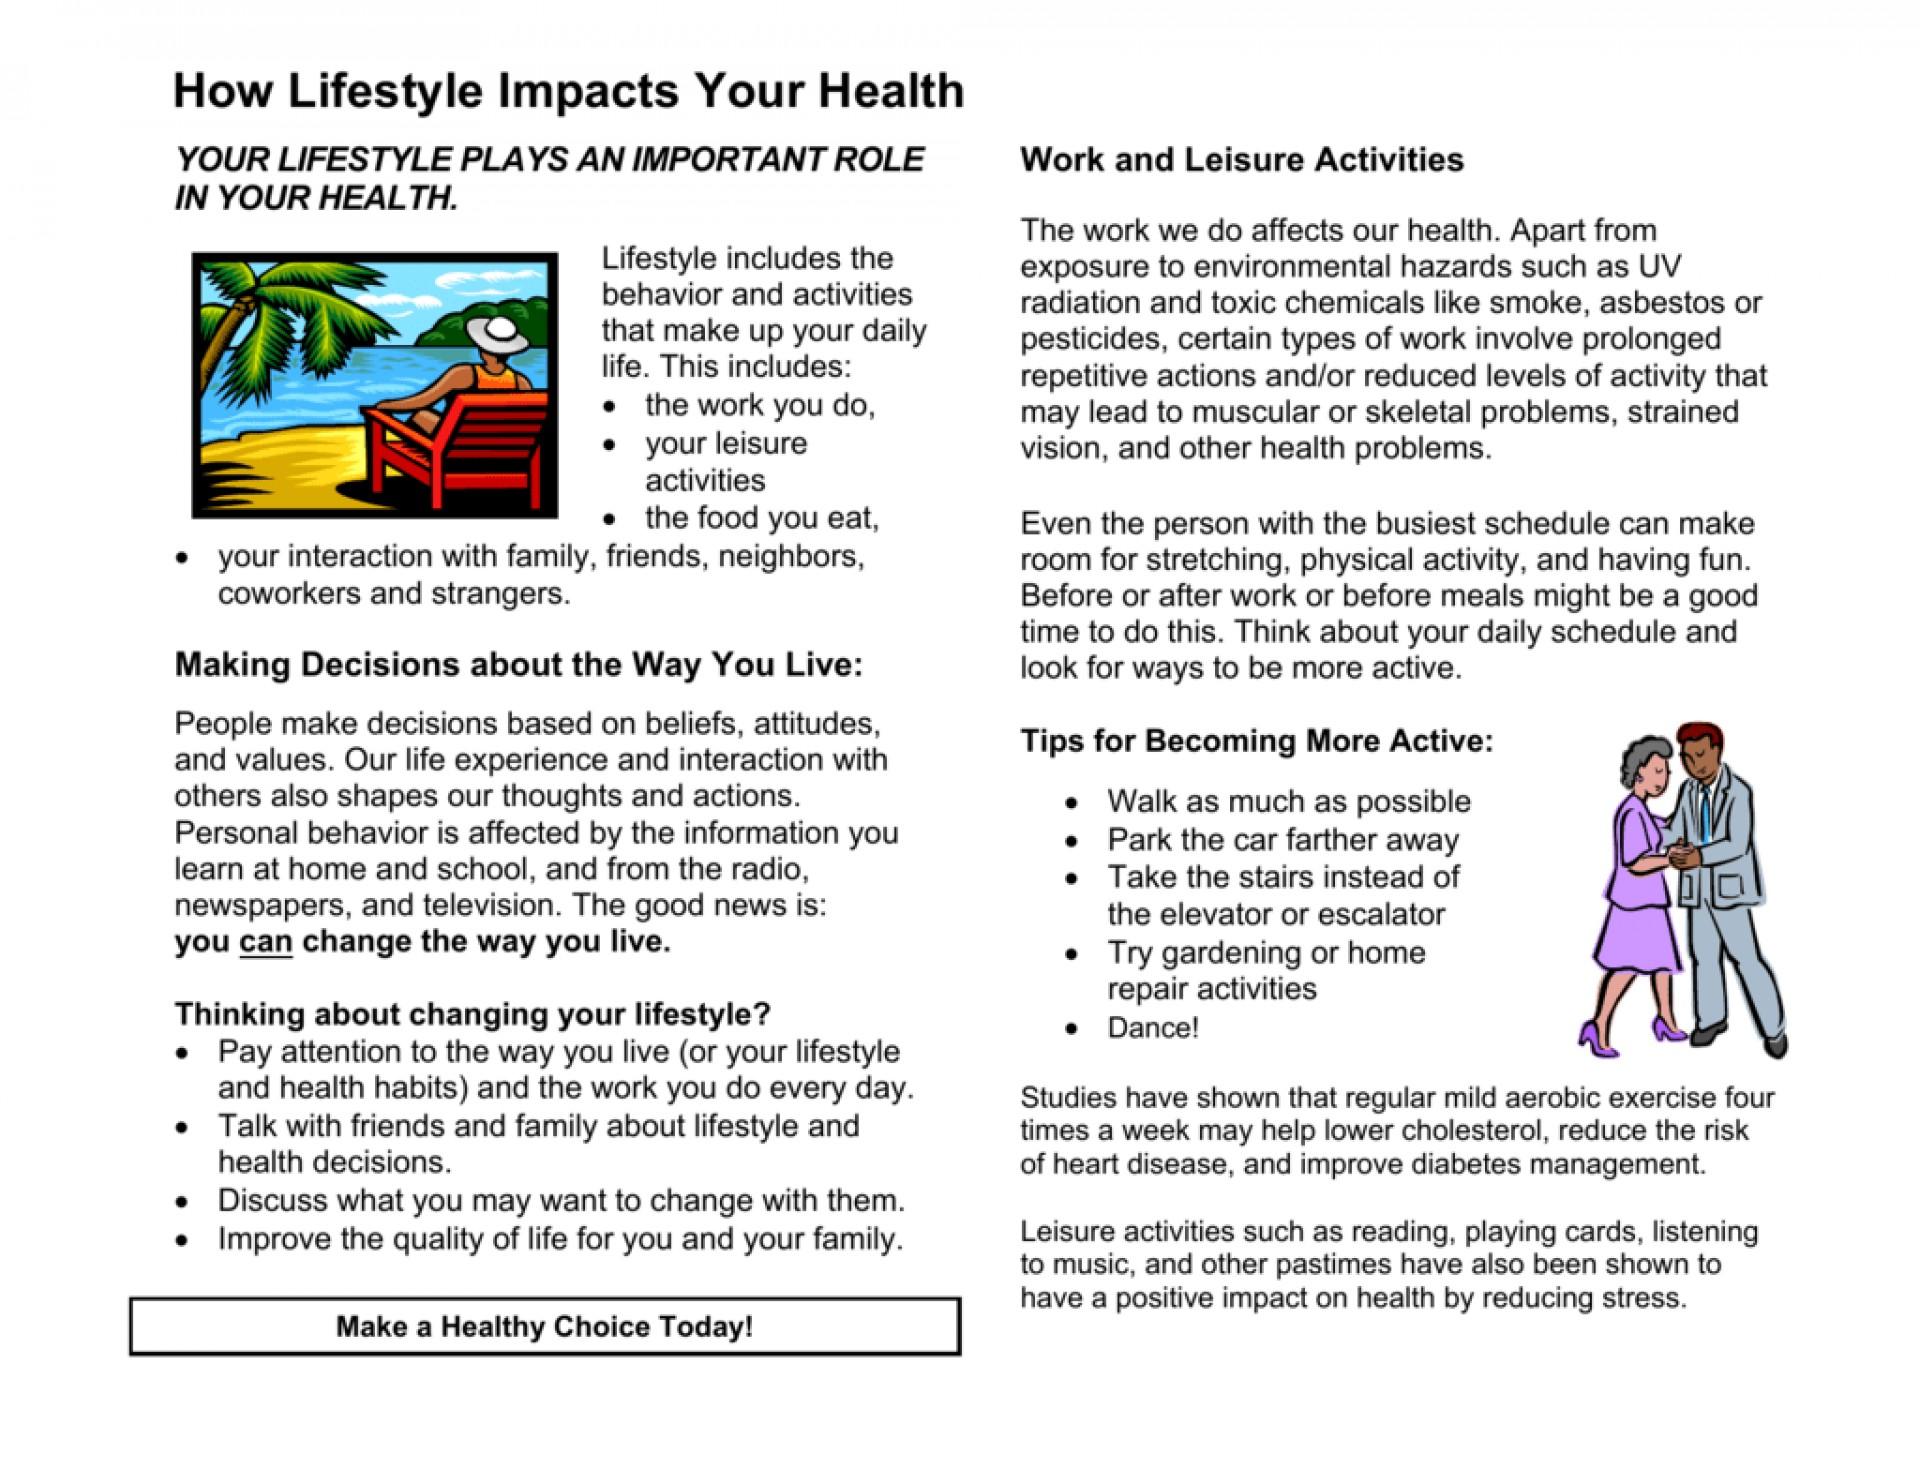 015 Lifestyle And Cardiac Health Essay Example 008690179 1 Beautiful 1920